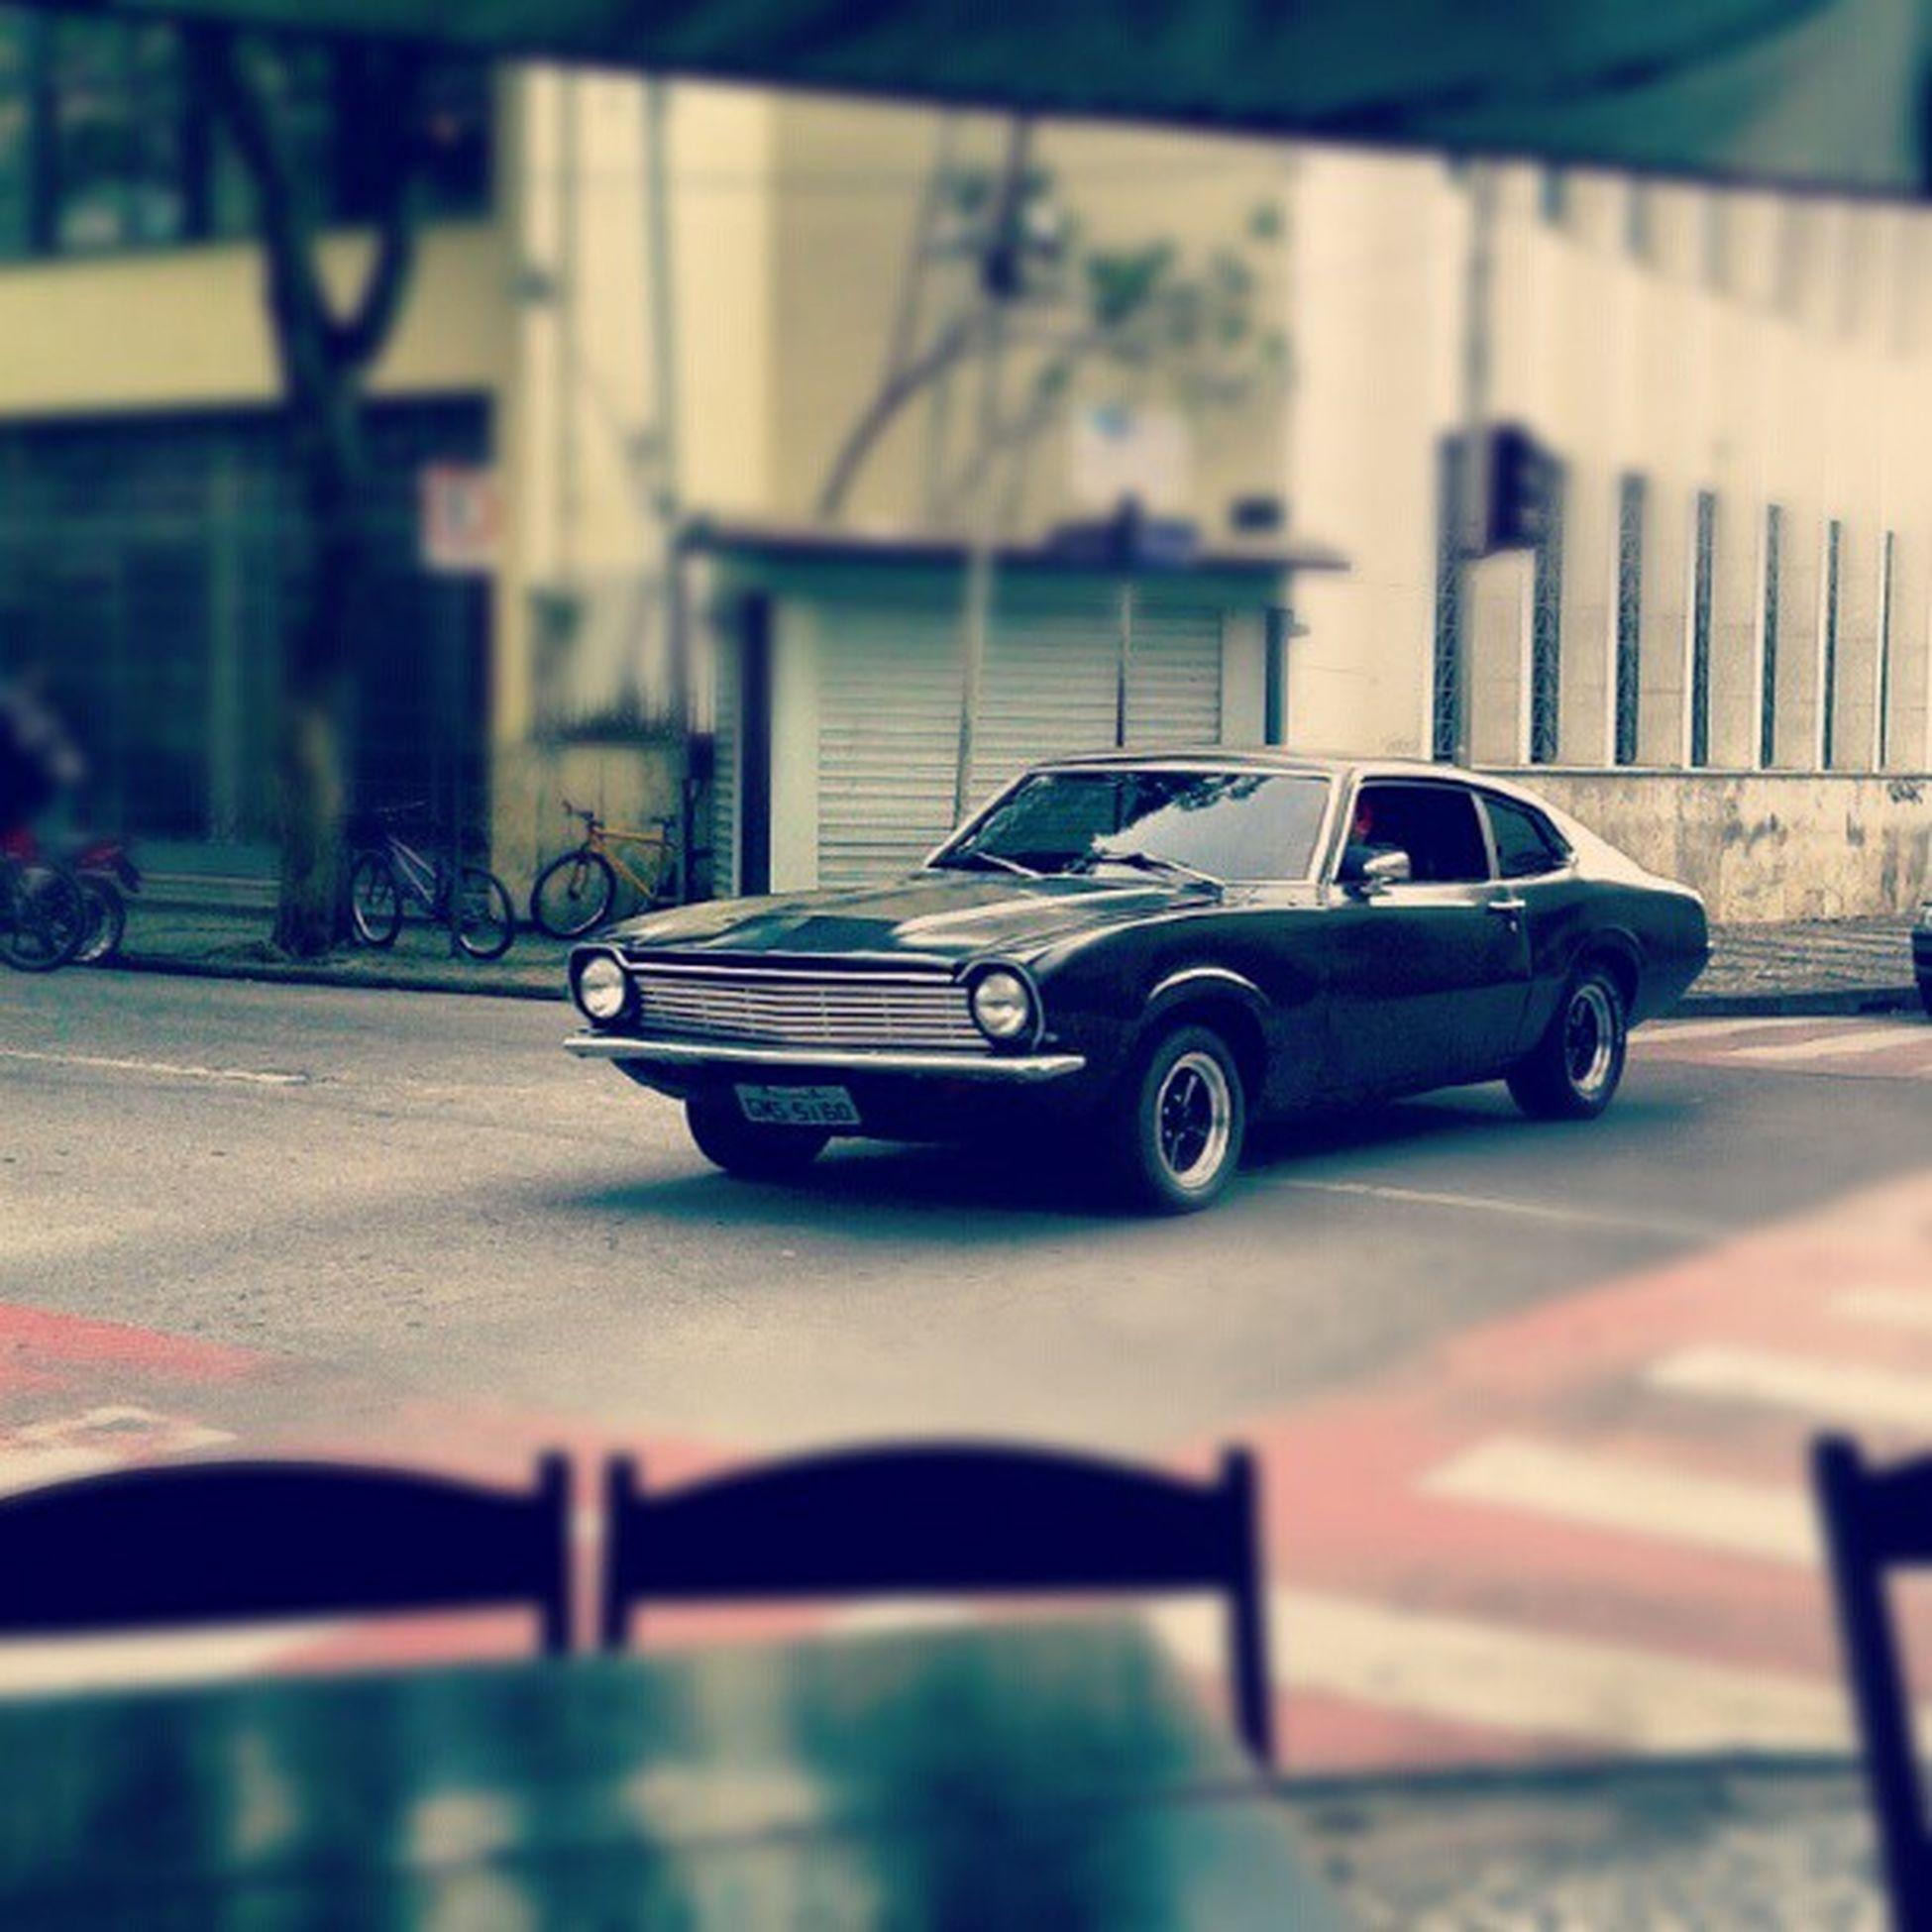 Oldcars Vintage Cars Street Photography Cars Eyem Best Shots Ontheroad Vintage Style Minas Gerais